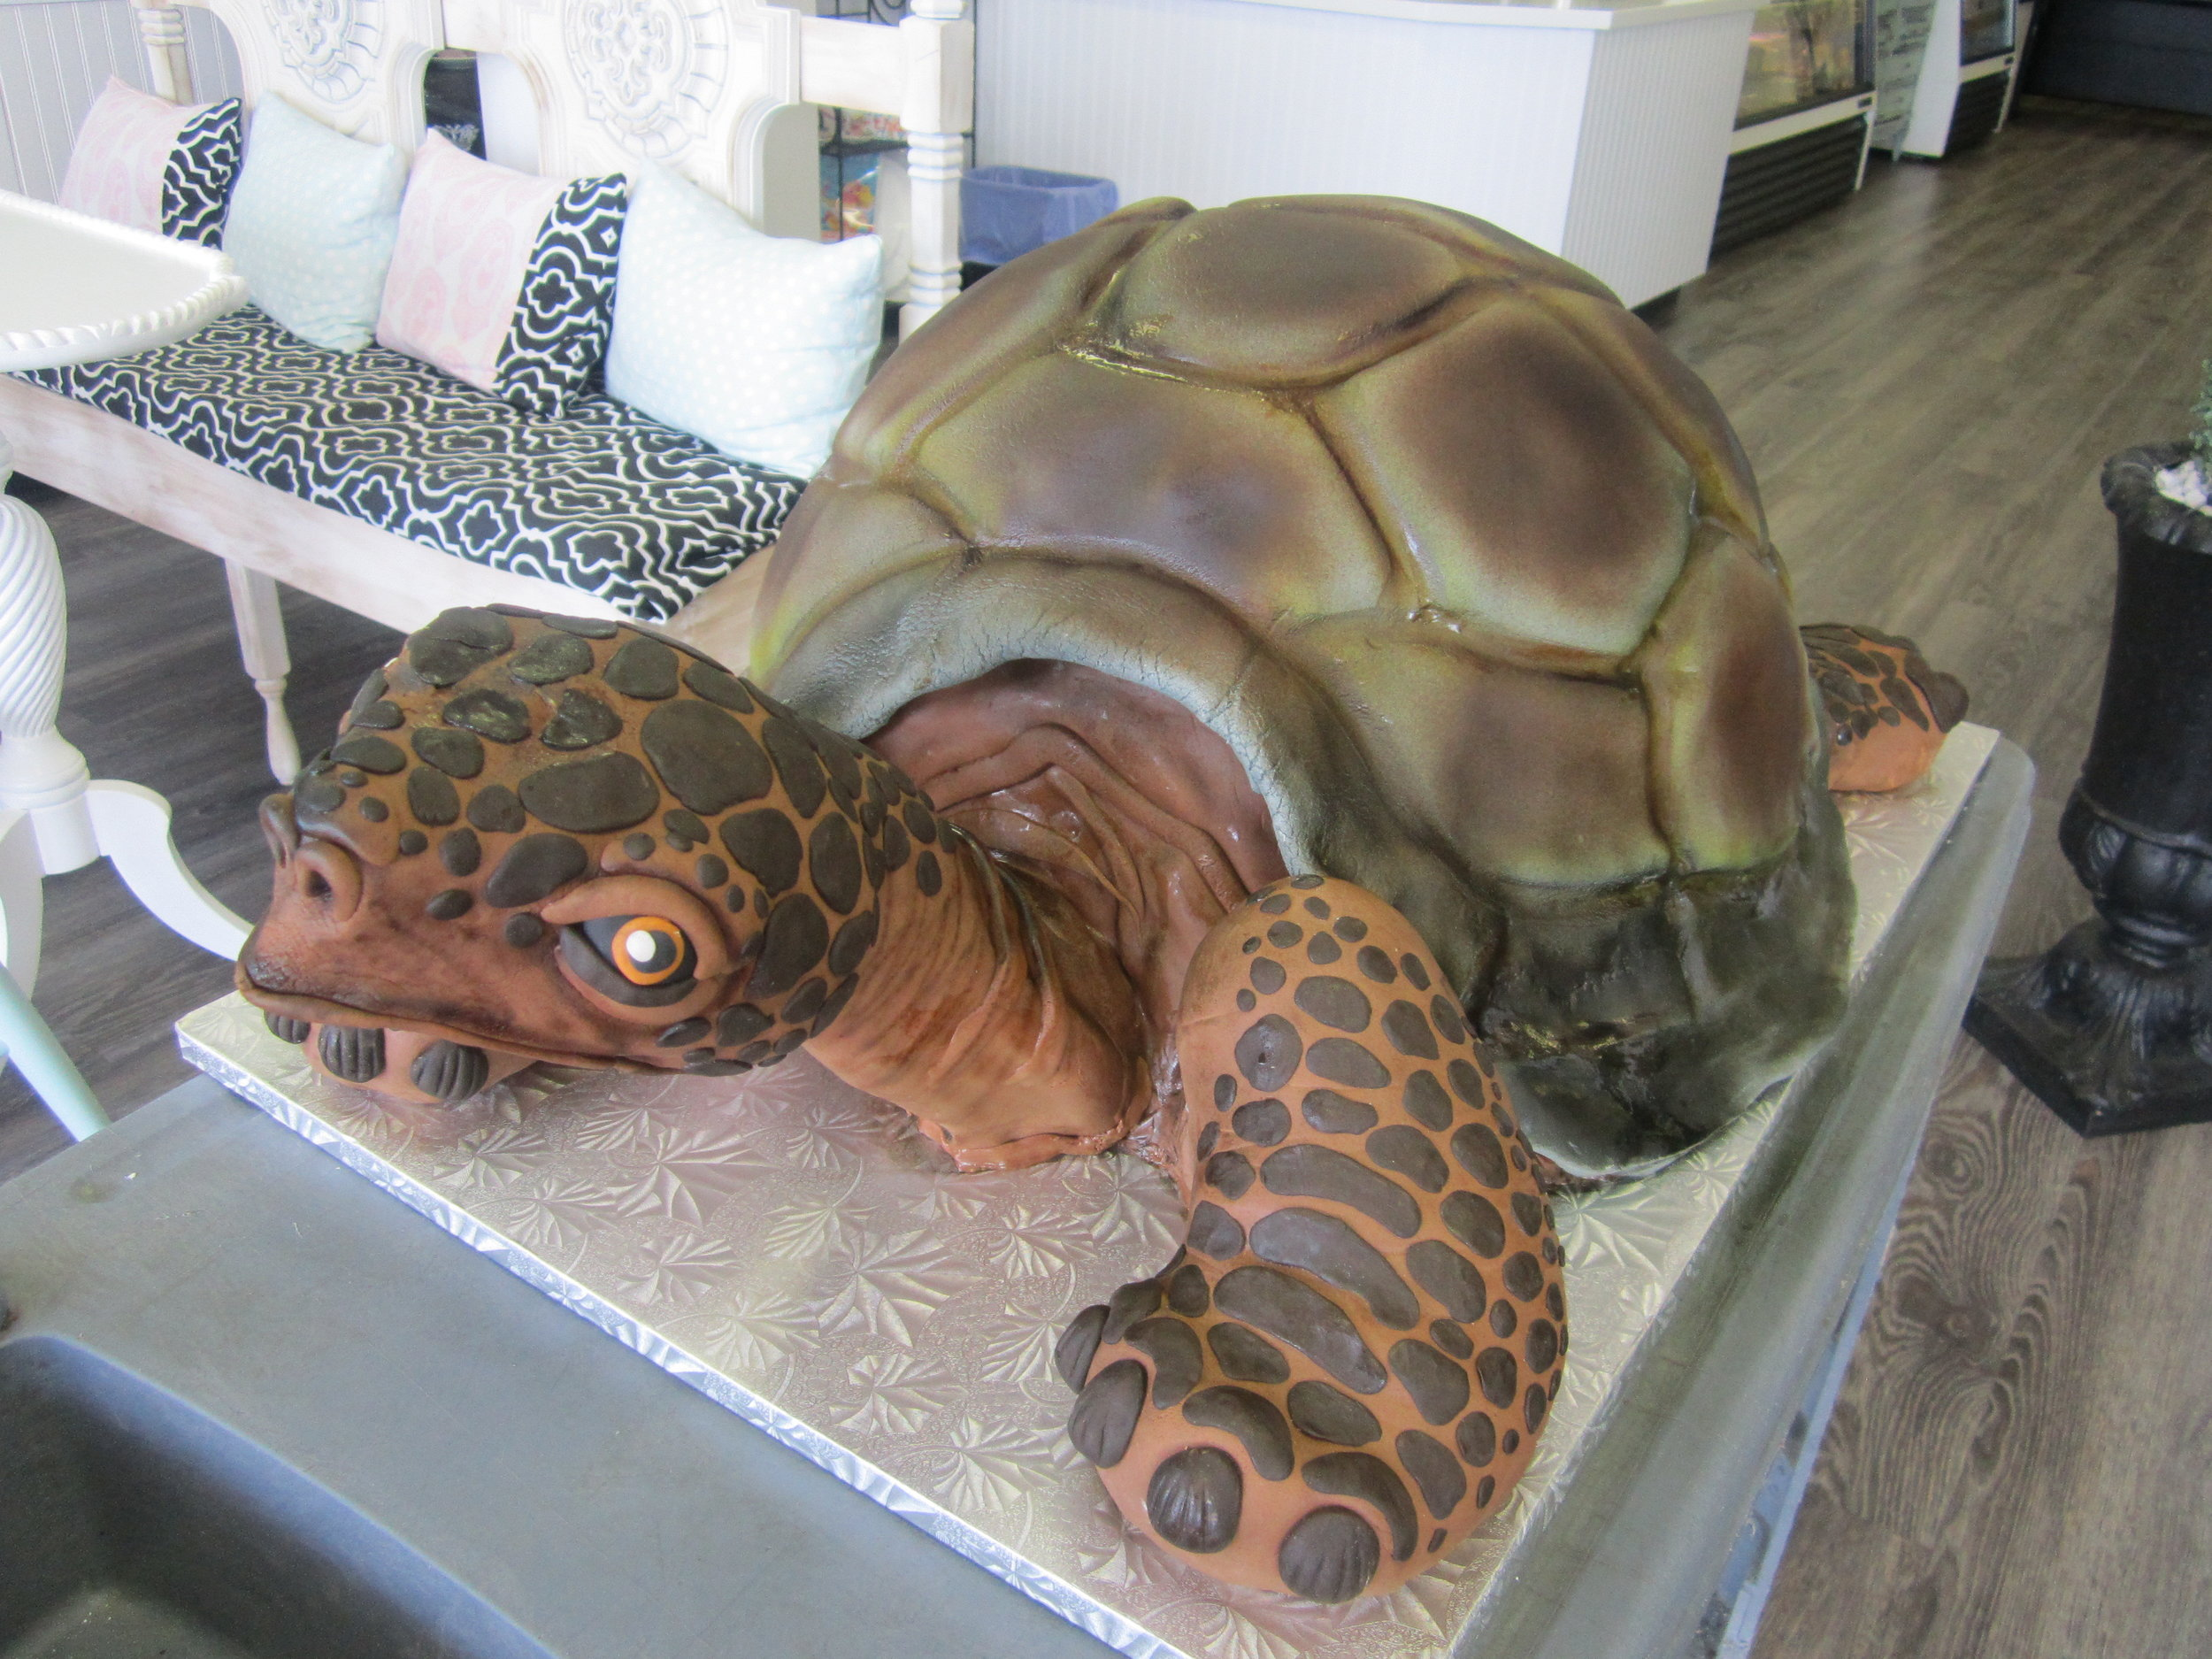 turtle-sculpted galapagos.JPG